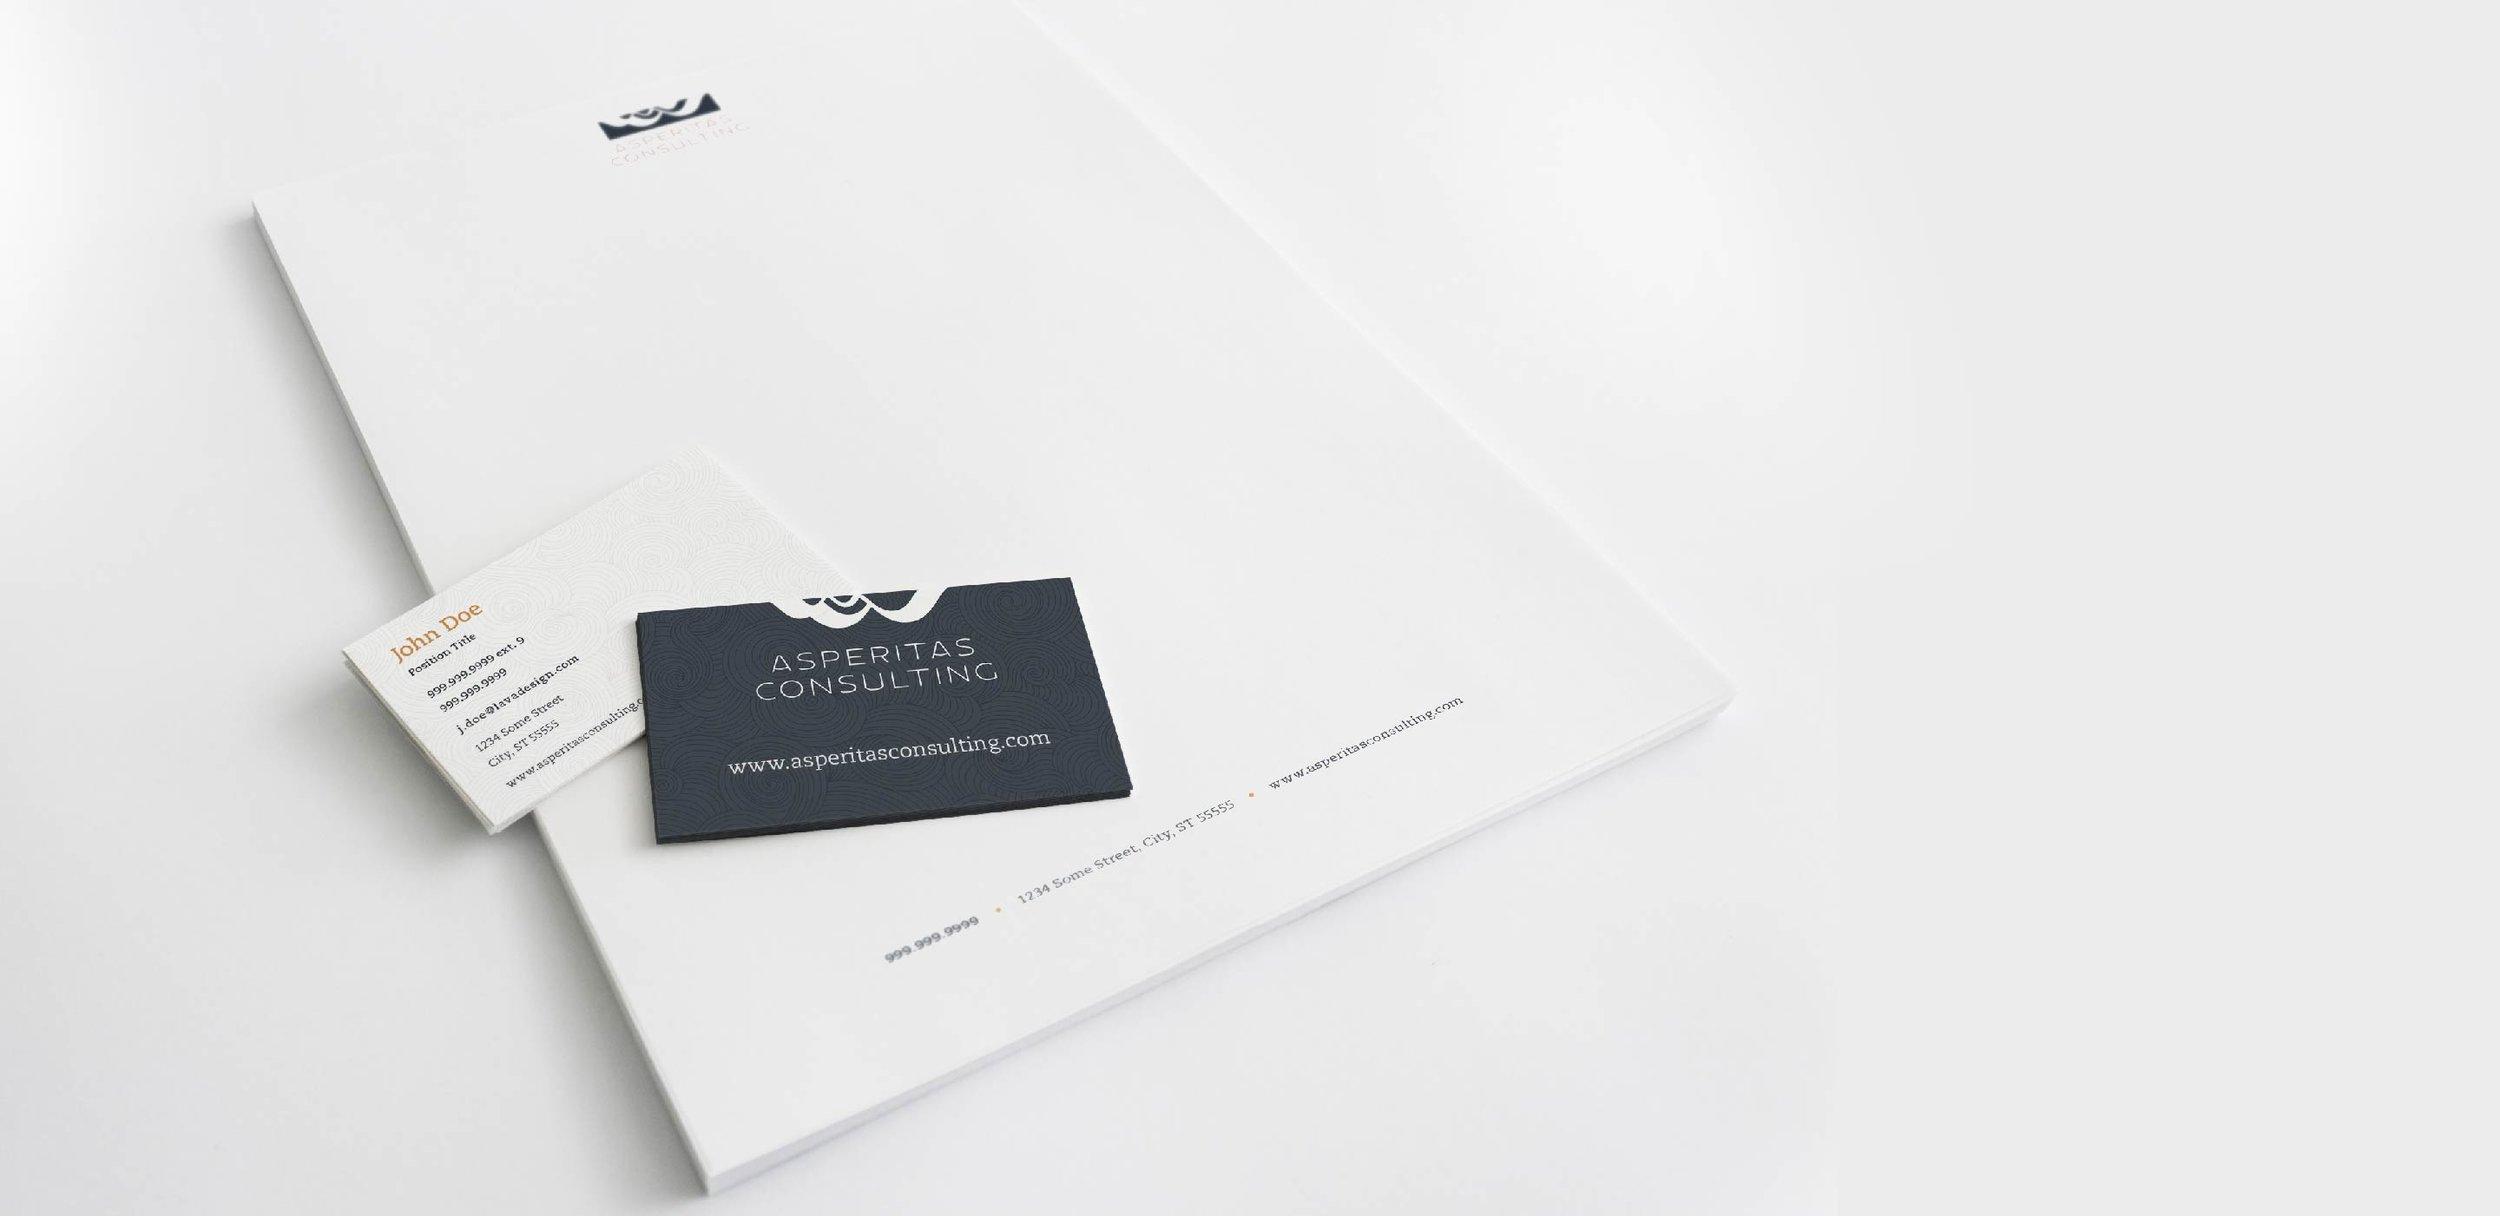 Asperitas brand logo stationary graphic design 1.jpg